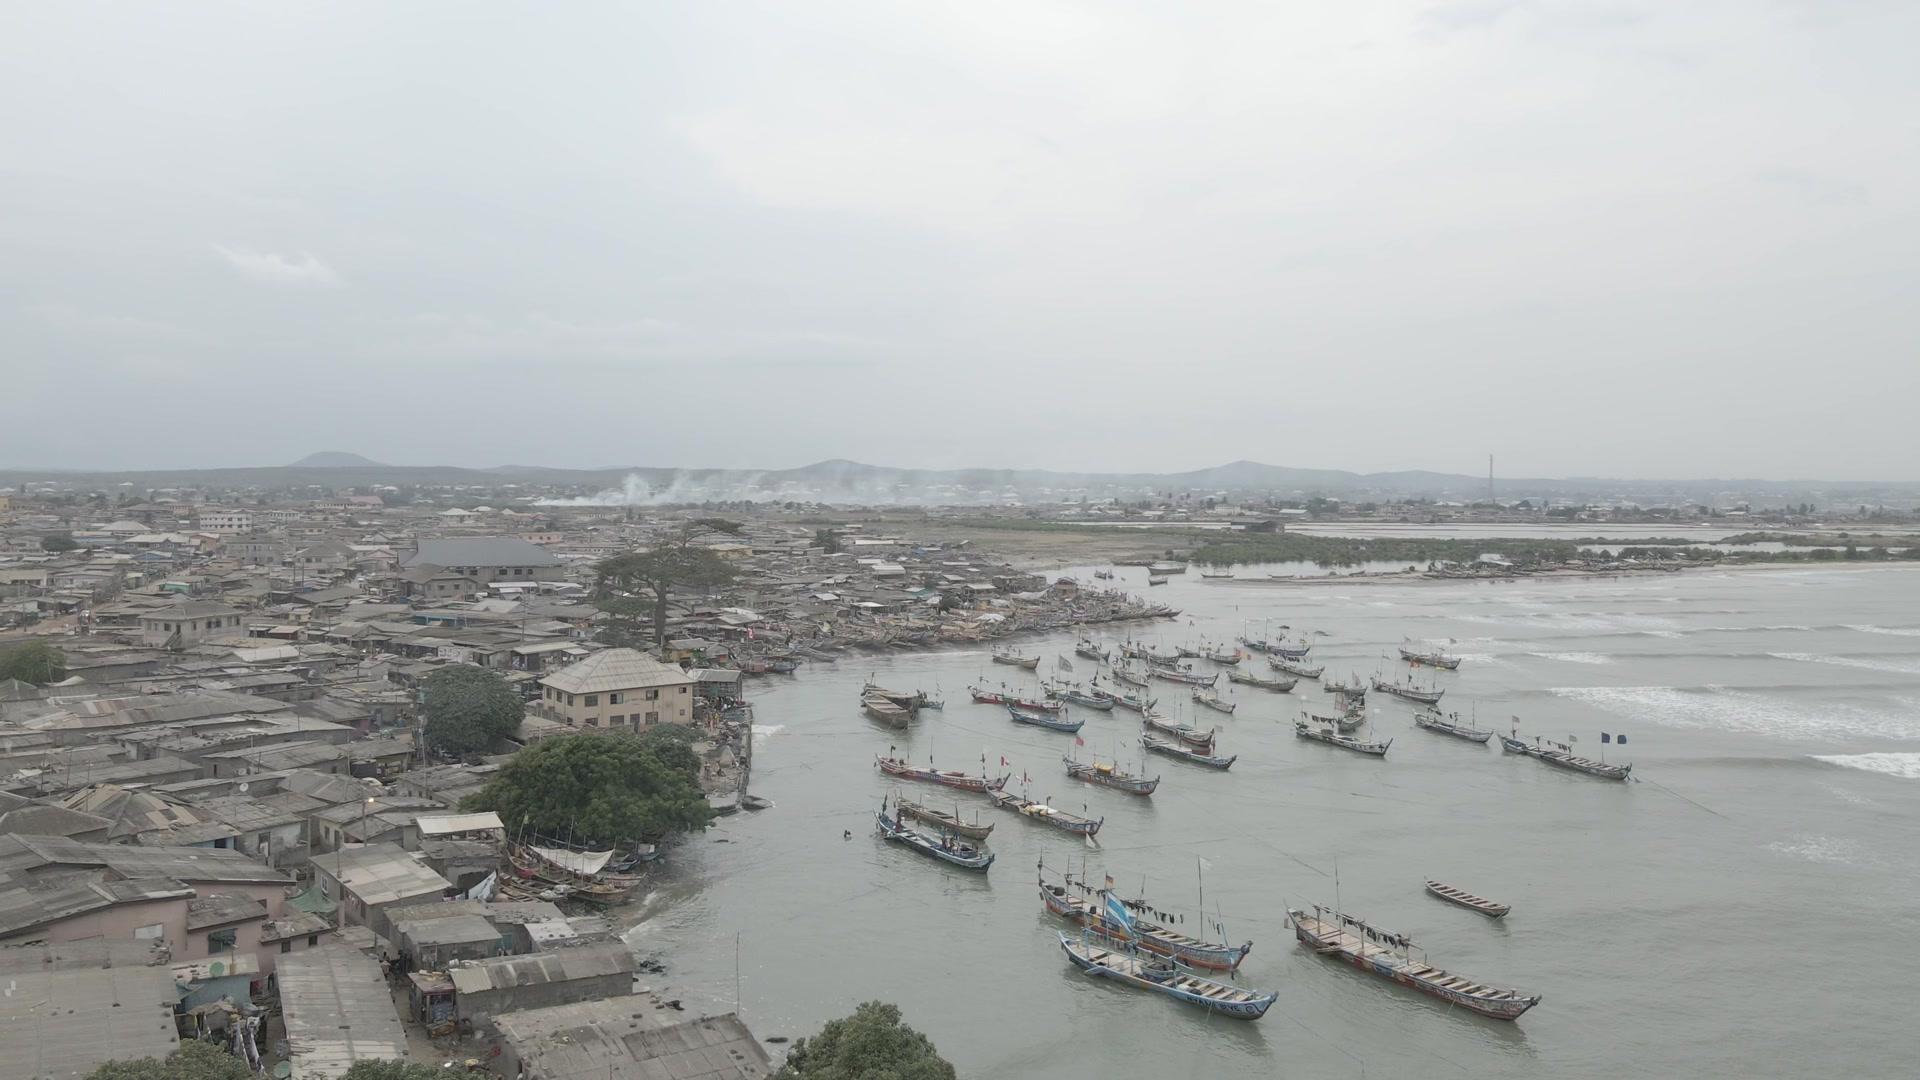 Town Settlement Boats Fishing Port Orbit